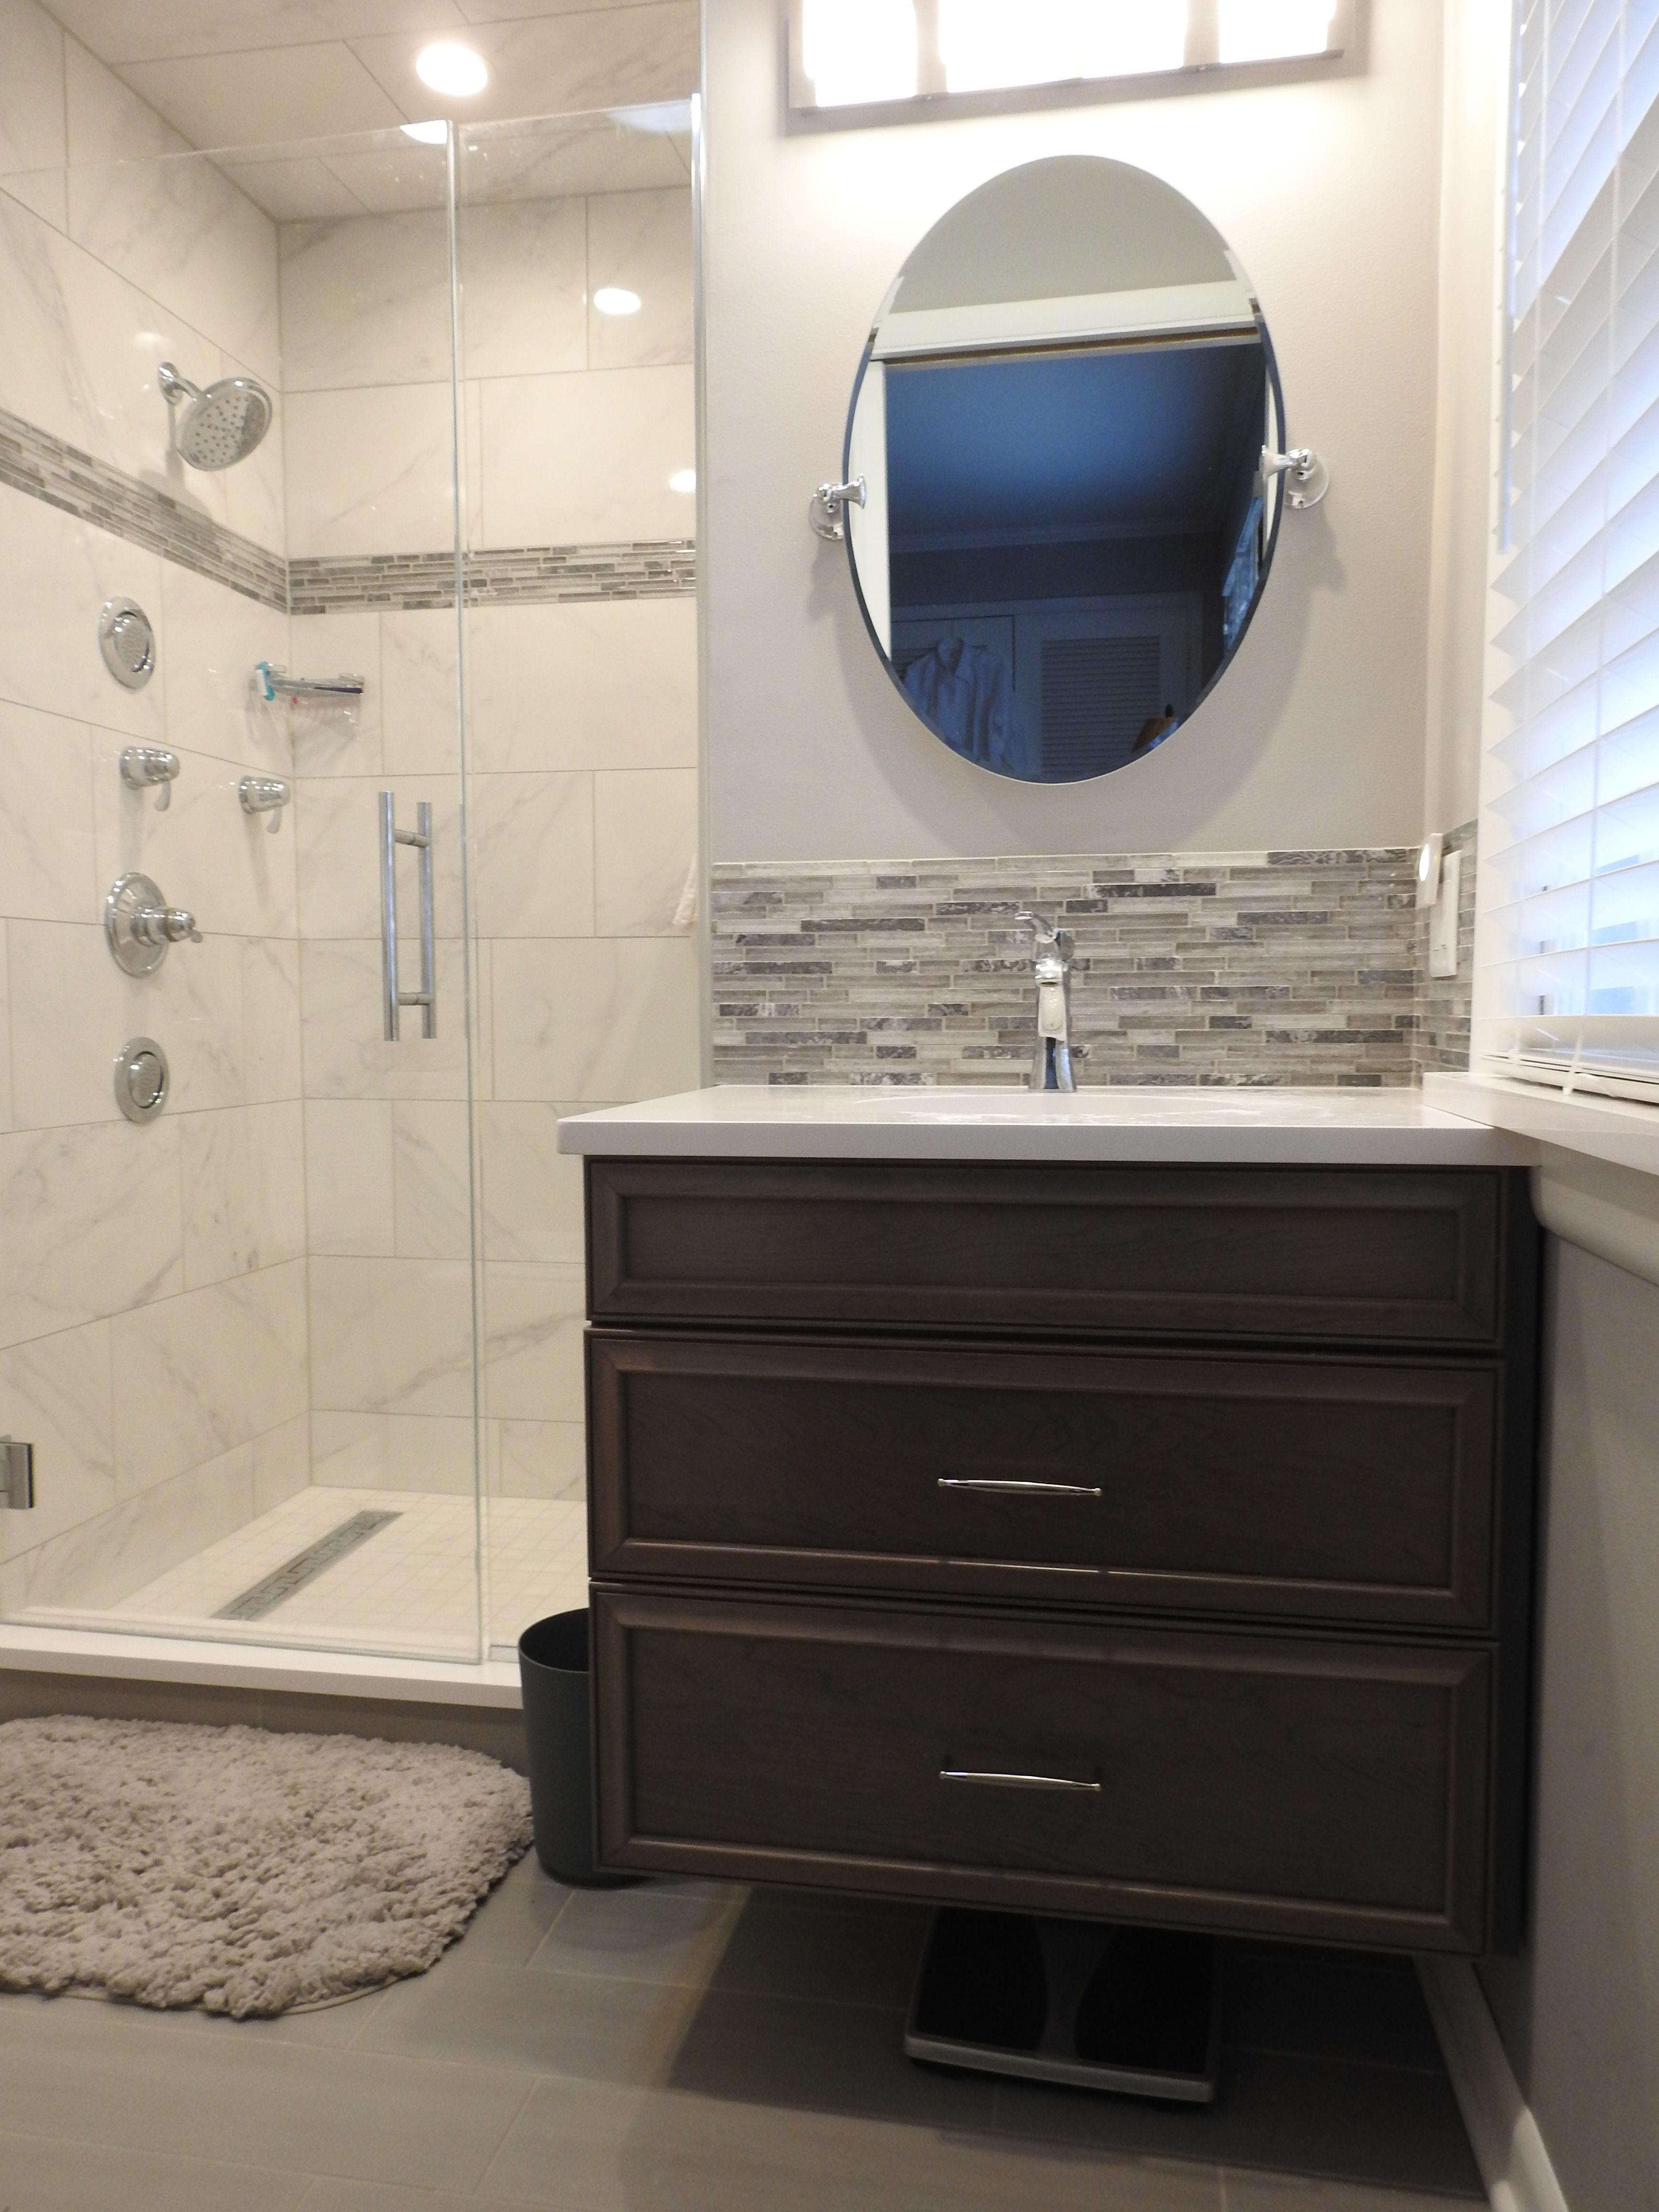 Master Bathroom Floating Vanity With Tile Backsplash In Western Springs Illinois Small Bathroom Remodel Master Bathroom Floating Vanity [ 4608 x 3456 Pixel ]